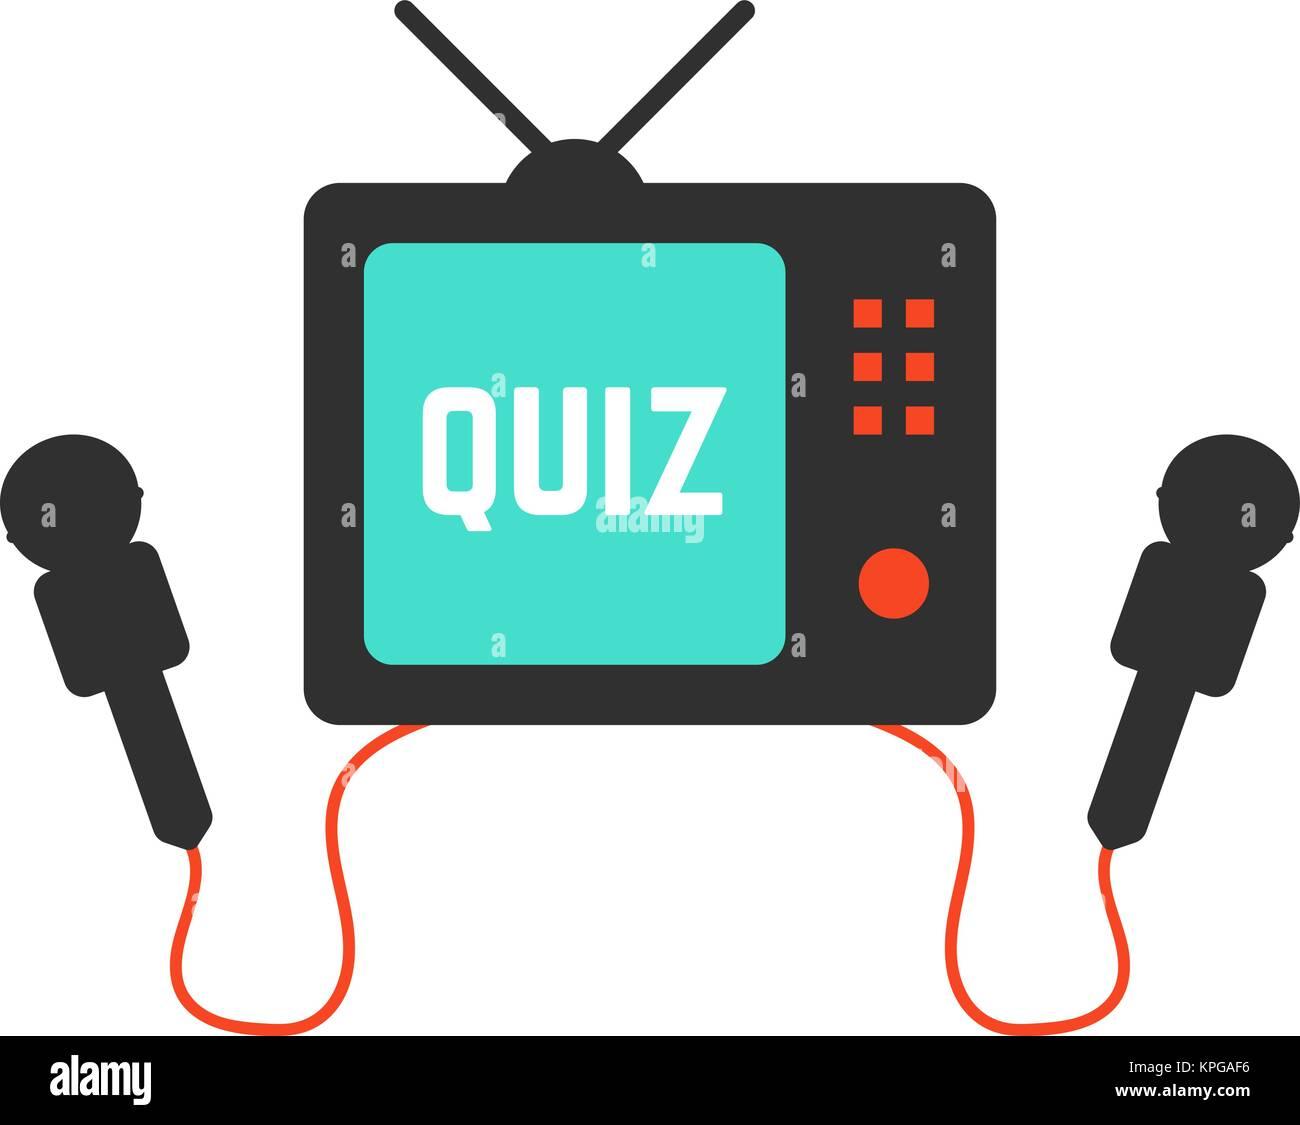 quiz on tv icon - Stock Vector